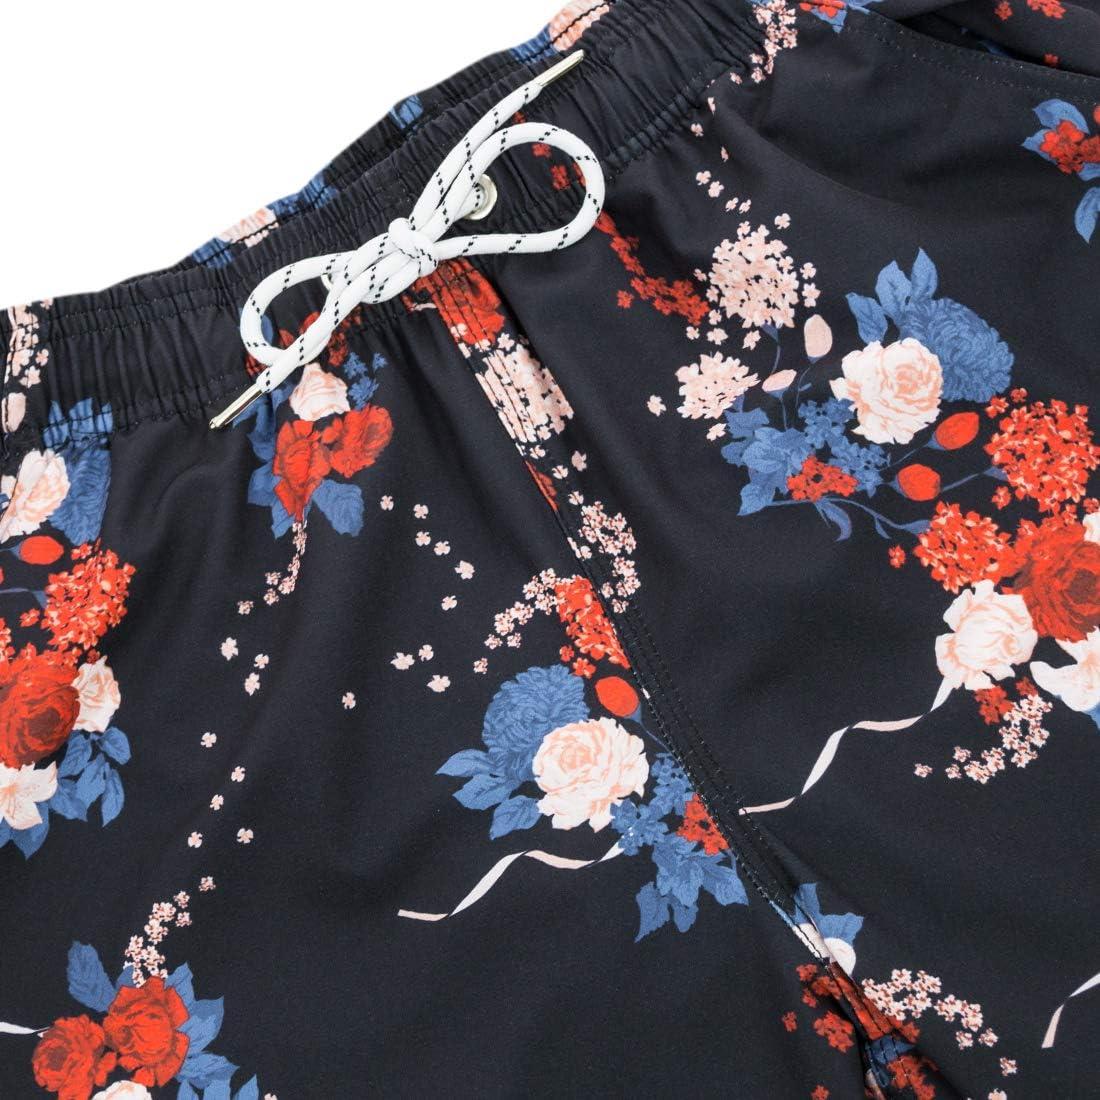 APTRO Mens Swimming Trunks with Pockets Beach Swimwear Quick Dry Elastic Waist Board Shorts